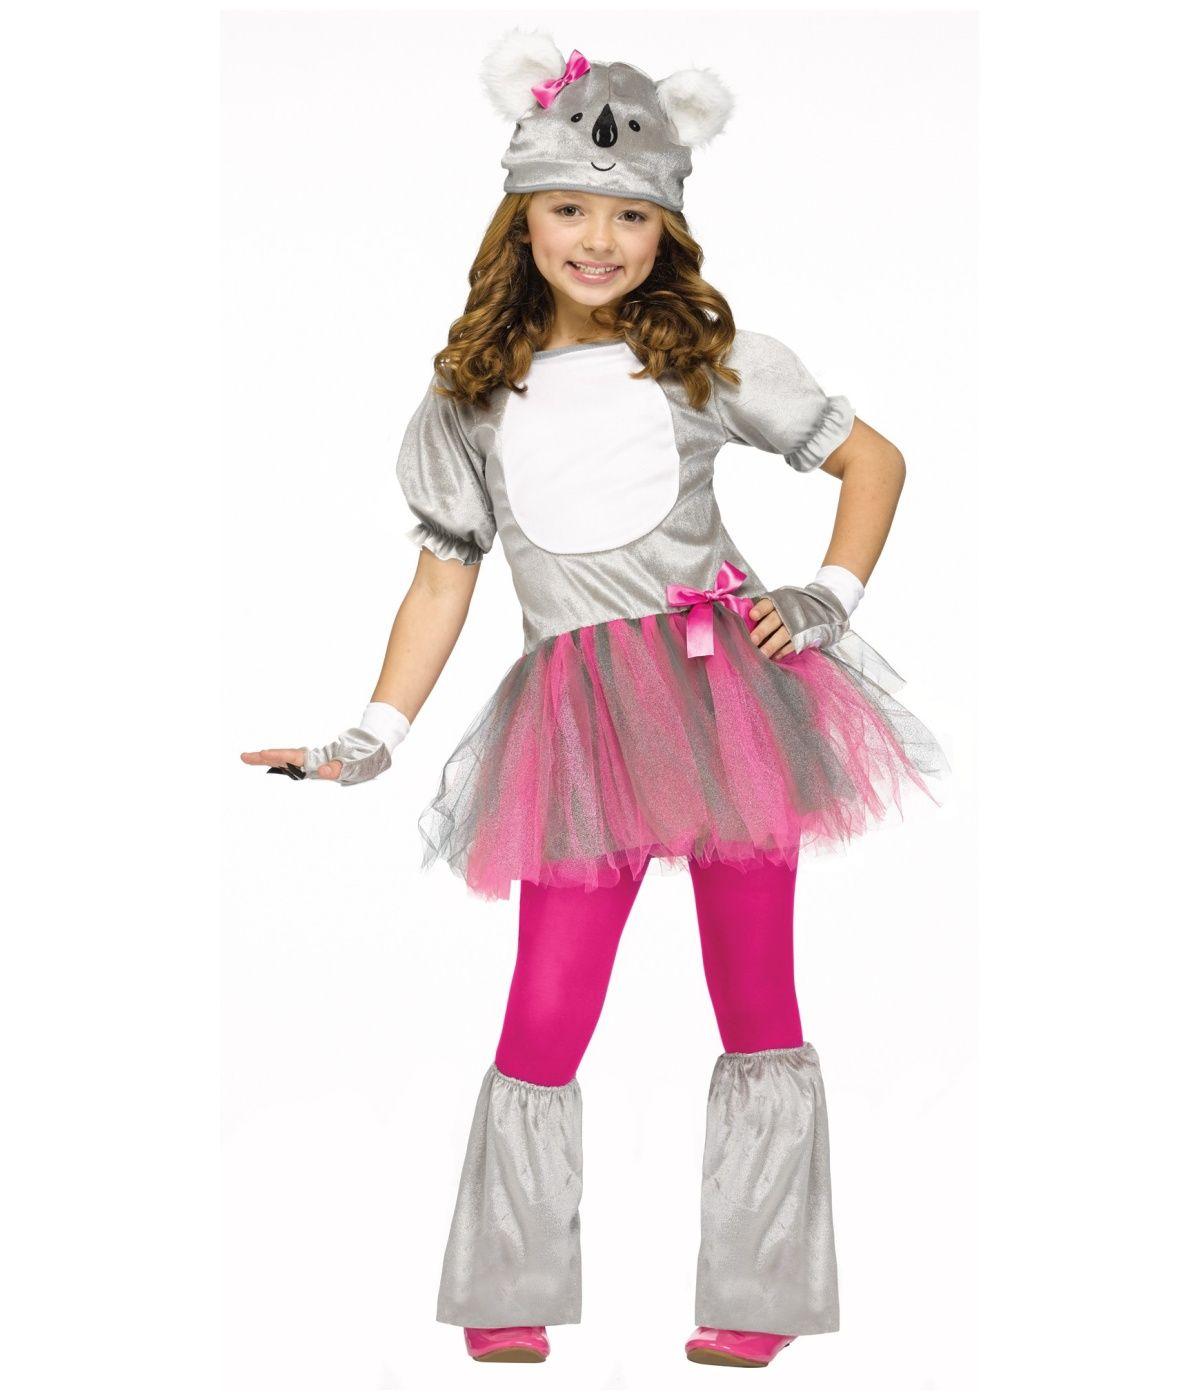 Beary Cute Girls Koala Costume | bat | Pinterest | Costumes ...